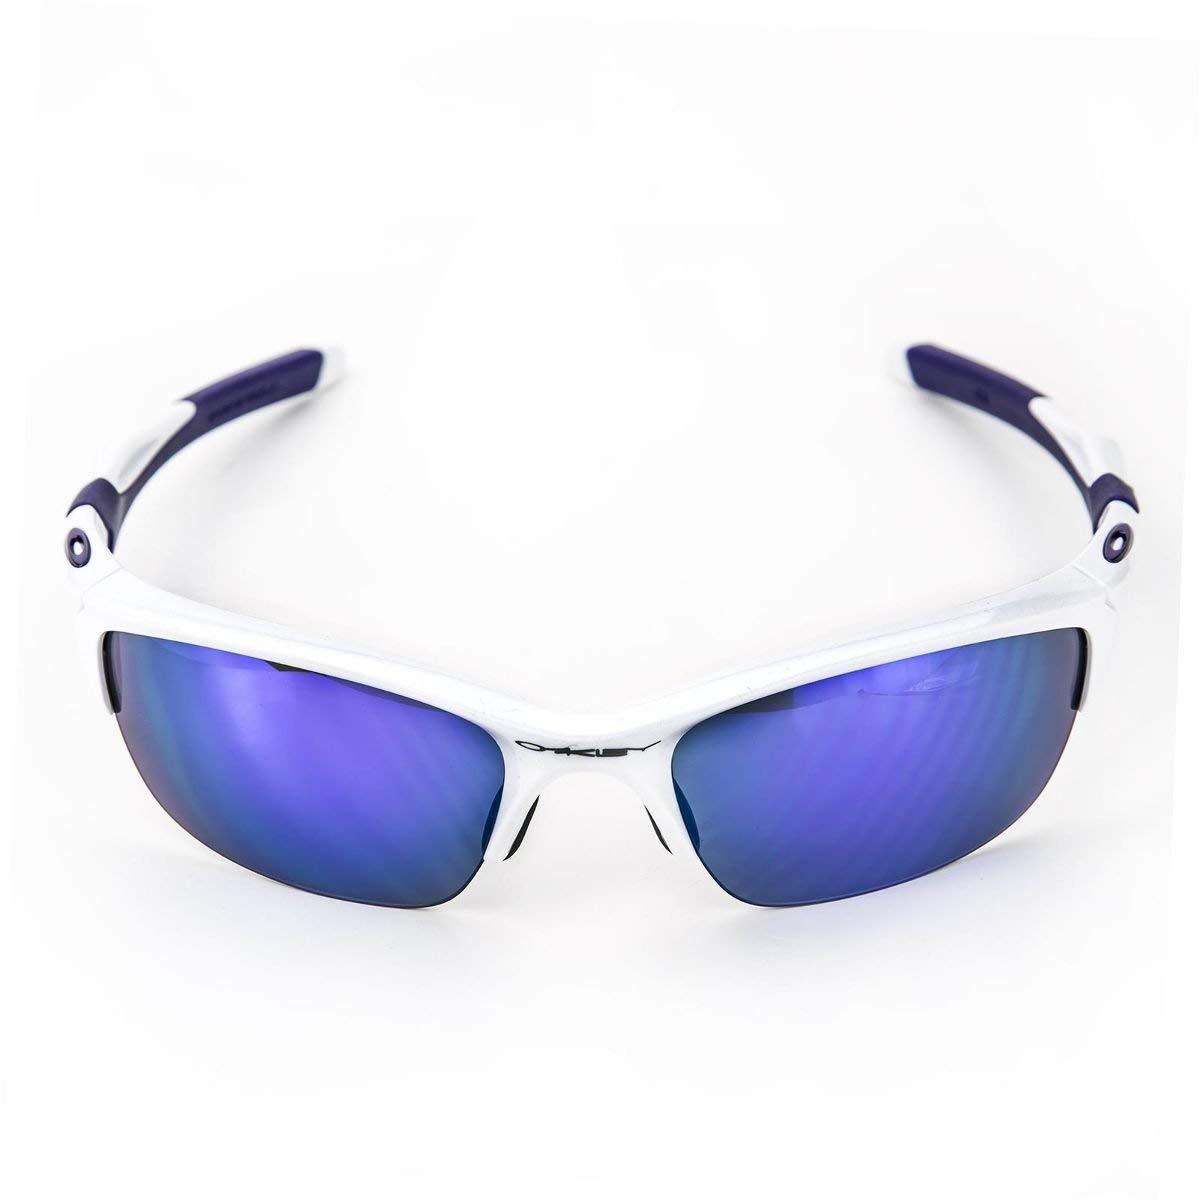 8ccf472746 Oakley Sonnenbrille HALF JACKET 2.0 (OO9144 914404 62): Amazon.fr:  Chaussures et Sacs